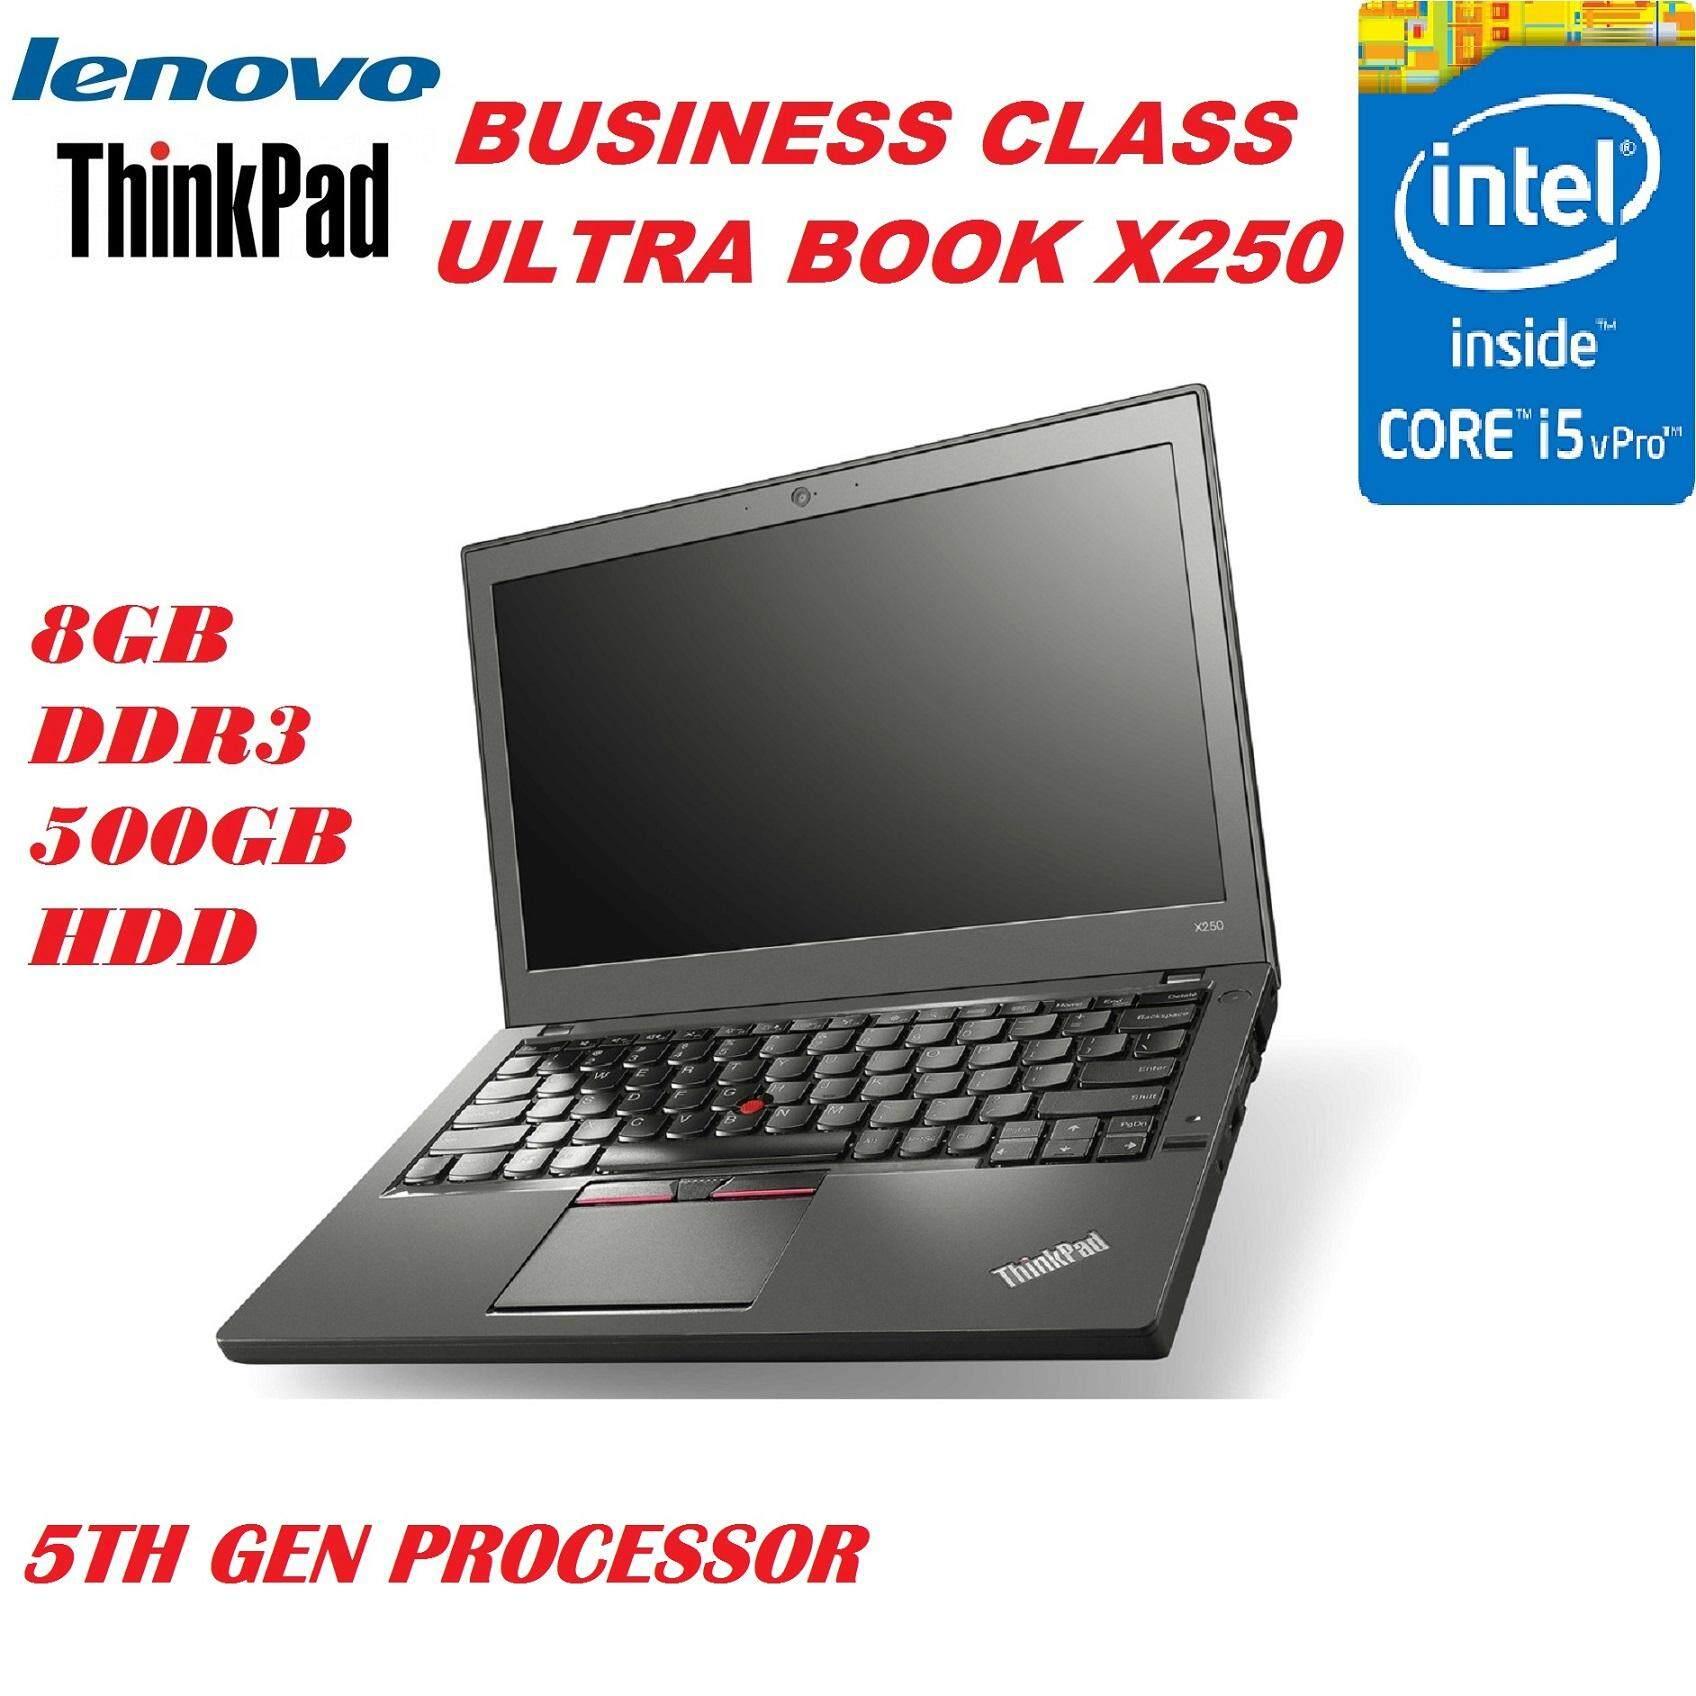 (REFURBISHED)LENOVO THIBNKPAD X250 ULTRABOOK ,INTEL CORE i5 5200U 5TH GEN PROCESSOR/8GB DDR3 RAM/500GB SATA DRIVE ,INTEL HD 5500 GRAPHIC CARD,12.5 LED SCREEN/WIN 8 PRO Malaysia